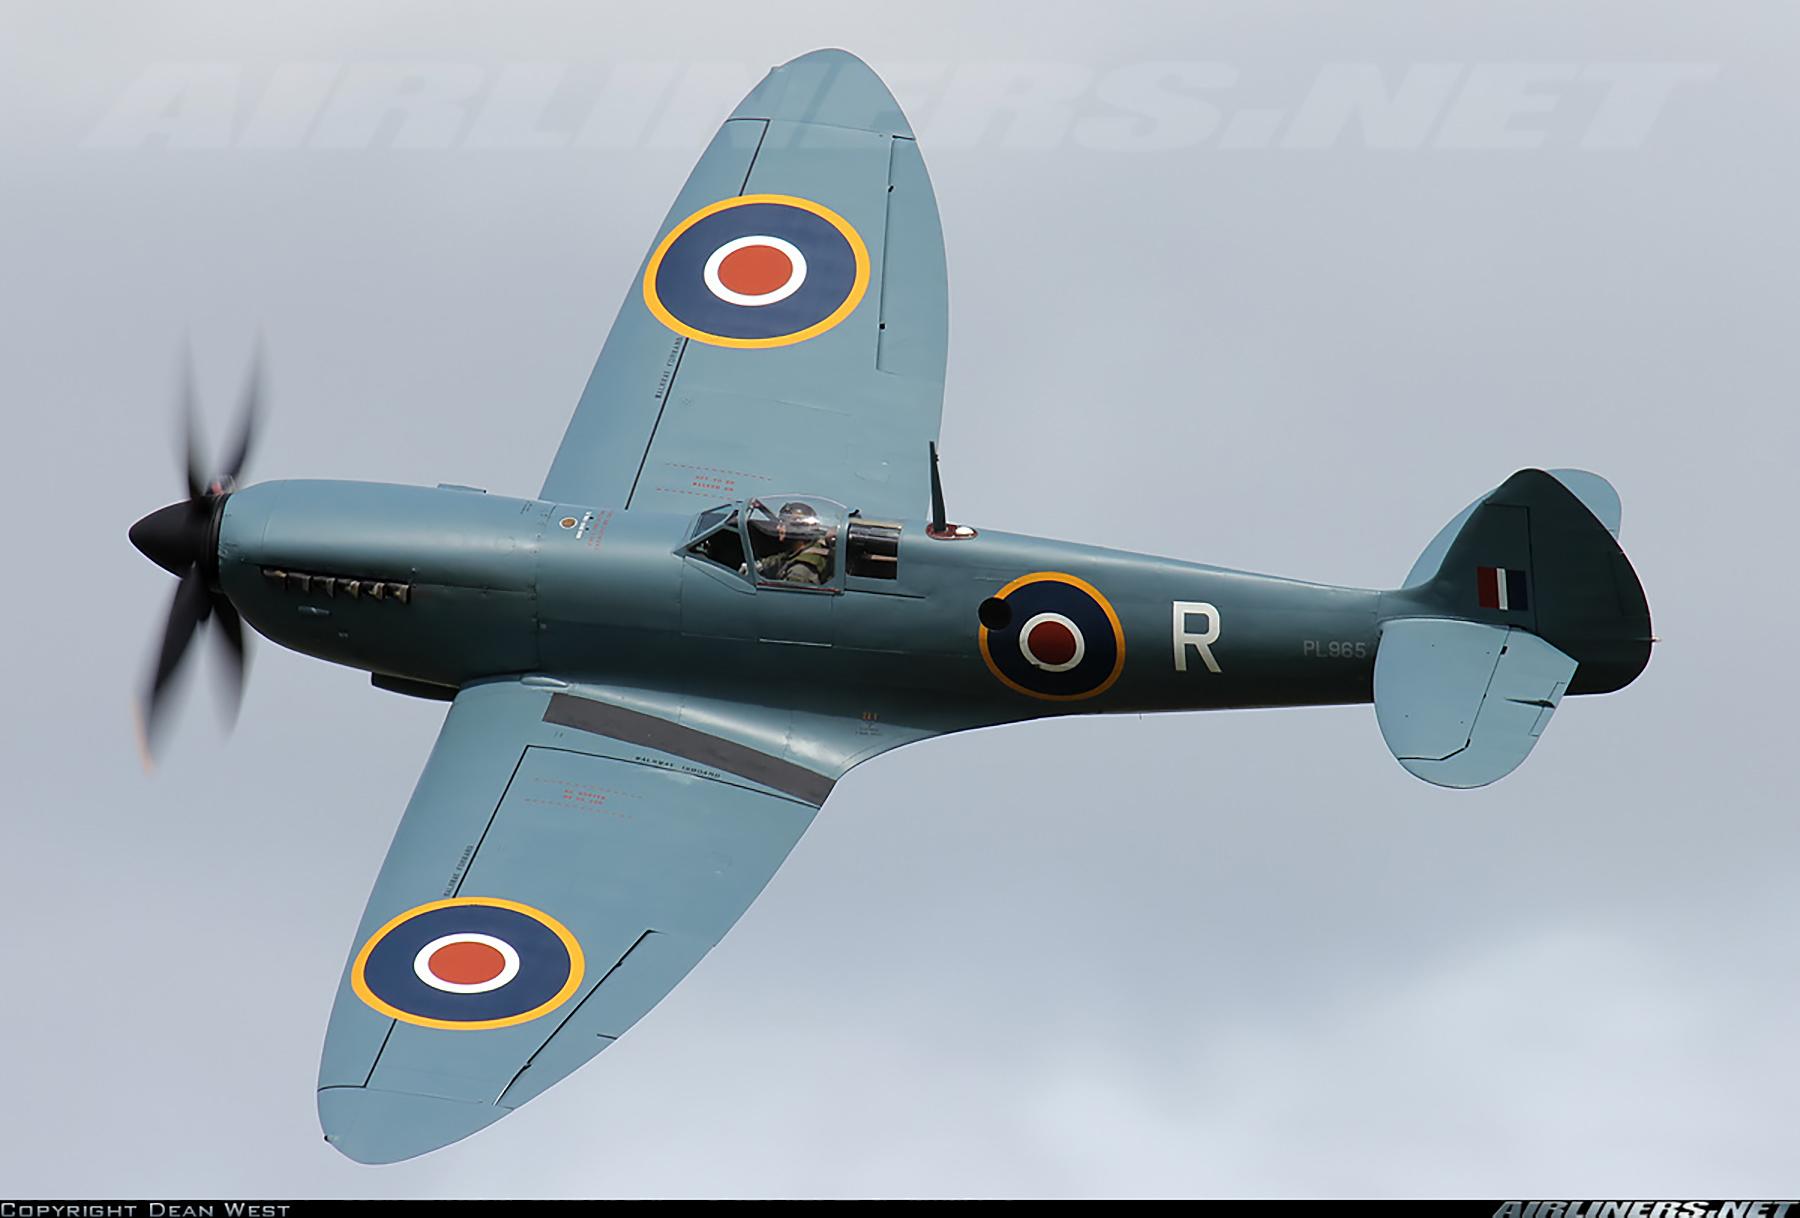 Airworthy Spitfire warbird PRXI RAF 16Sqn R PL965 pre D day 04